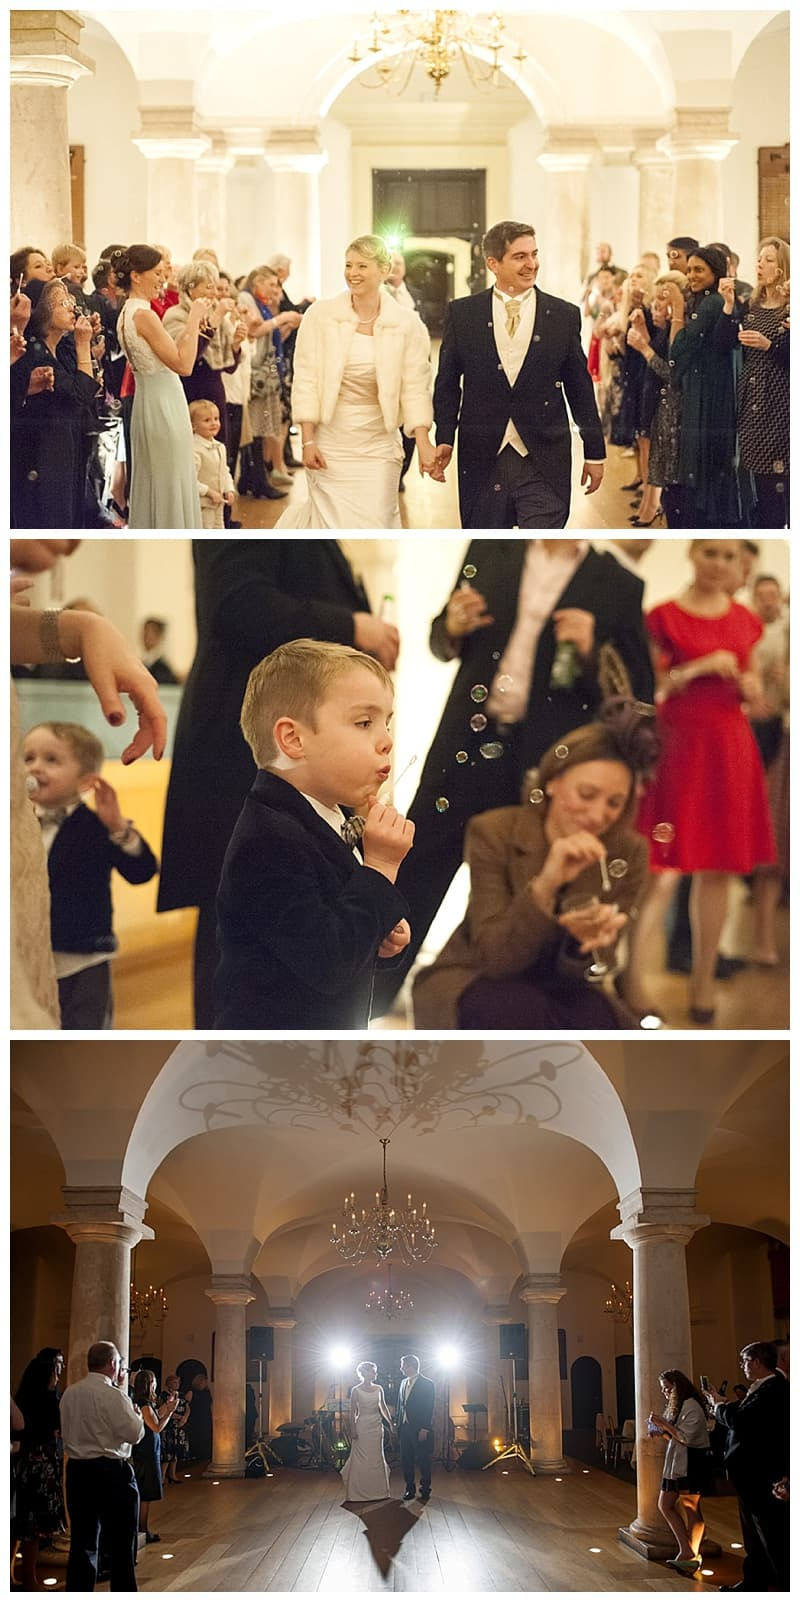 Royal Naval College Greenwich Wedding, Steve & Lisa, London Winter Wedding - Benjamin Wetherall Photography ©0054